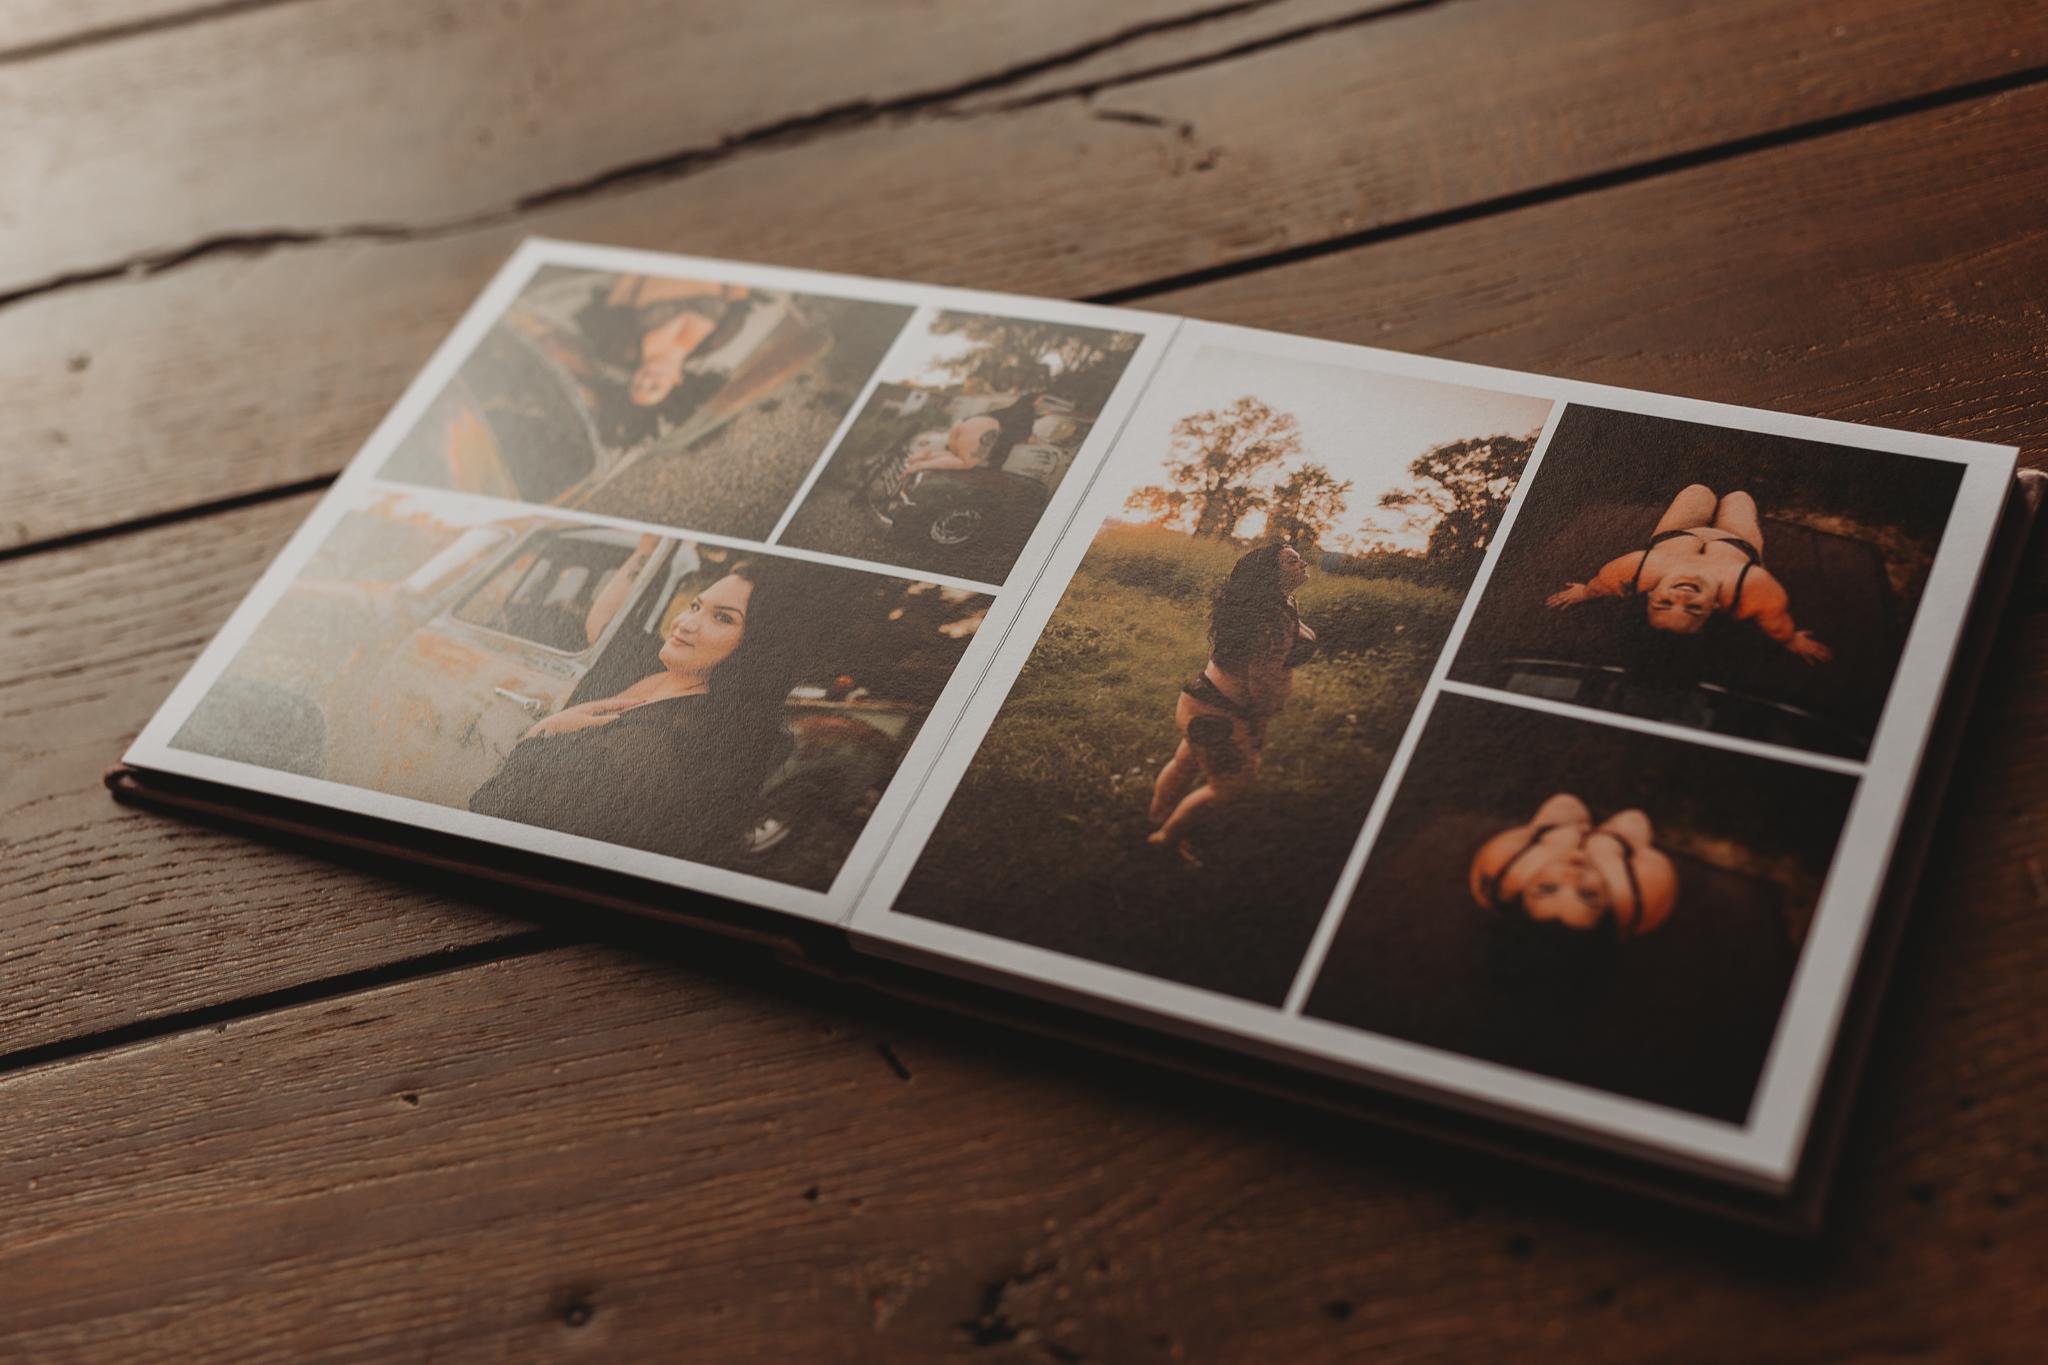 BOUDOIR BY LEXY CEDAR FALLS IOWA ALBUM-4.jpg